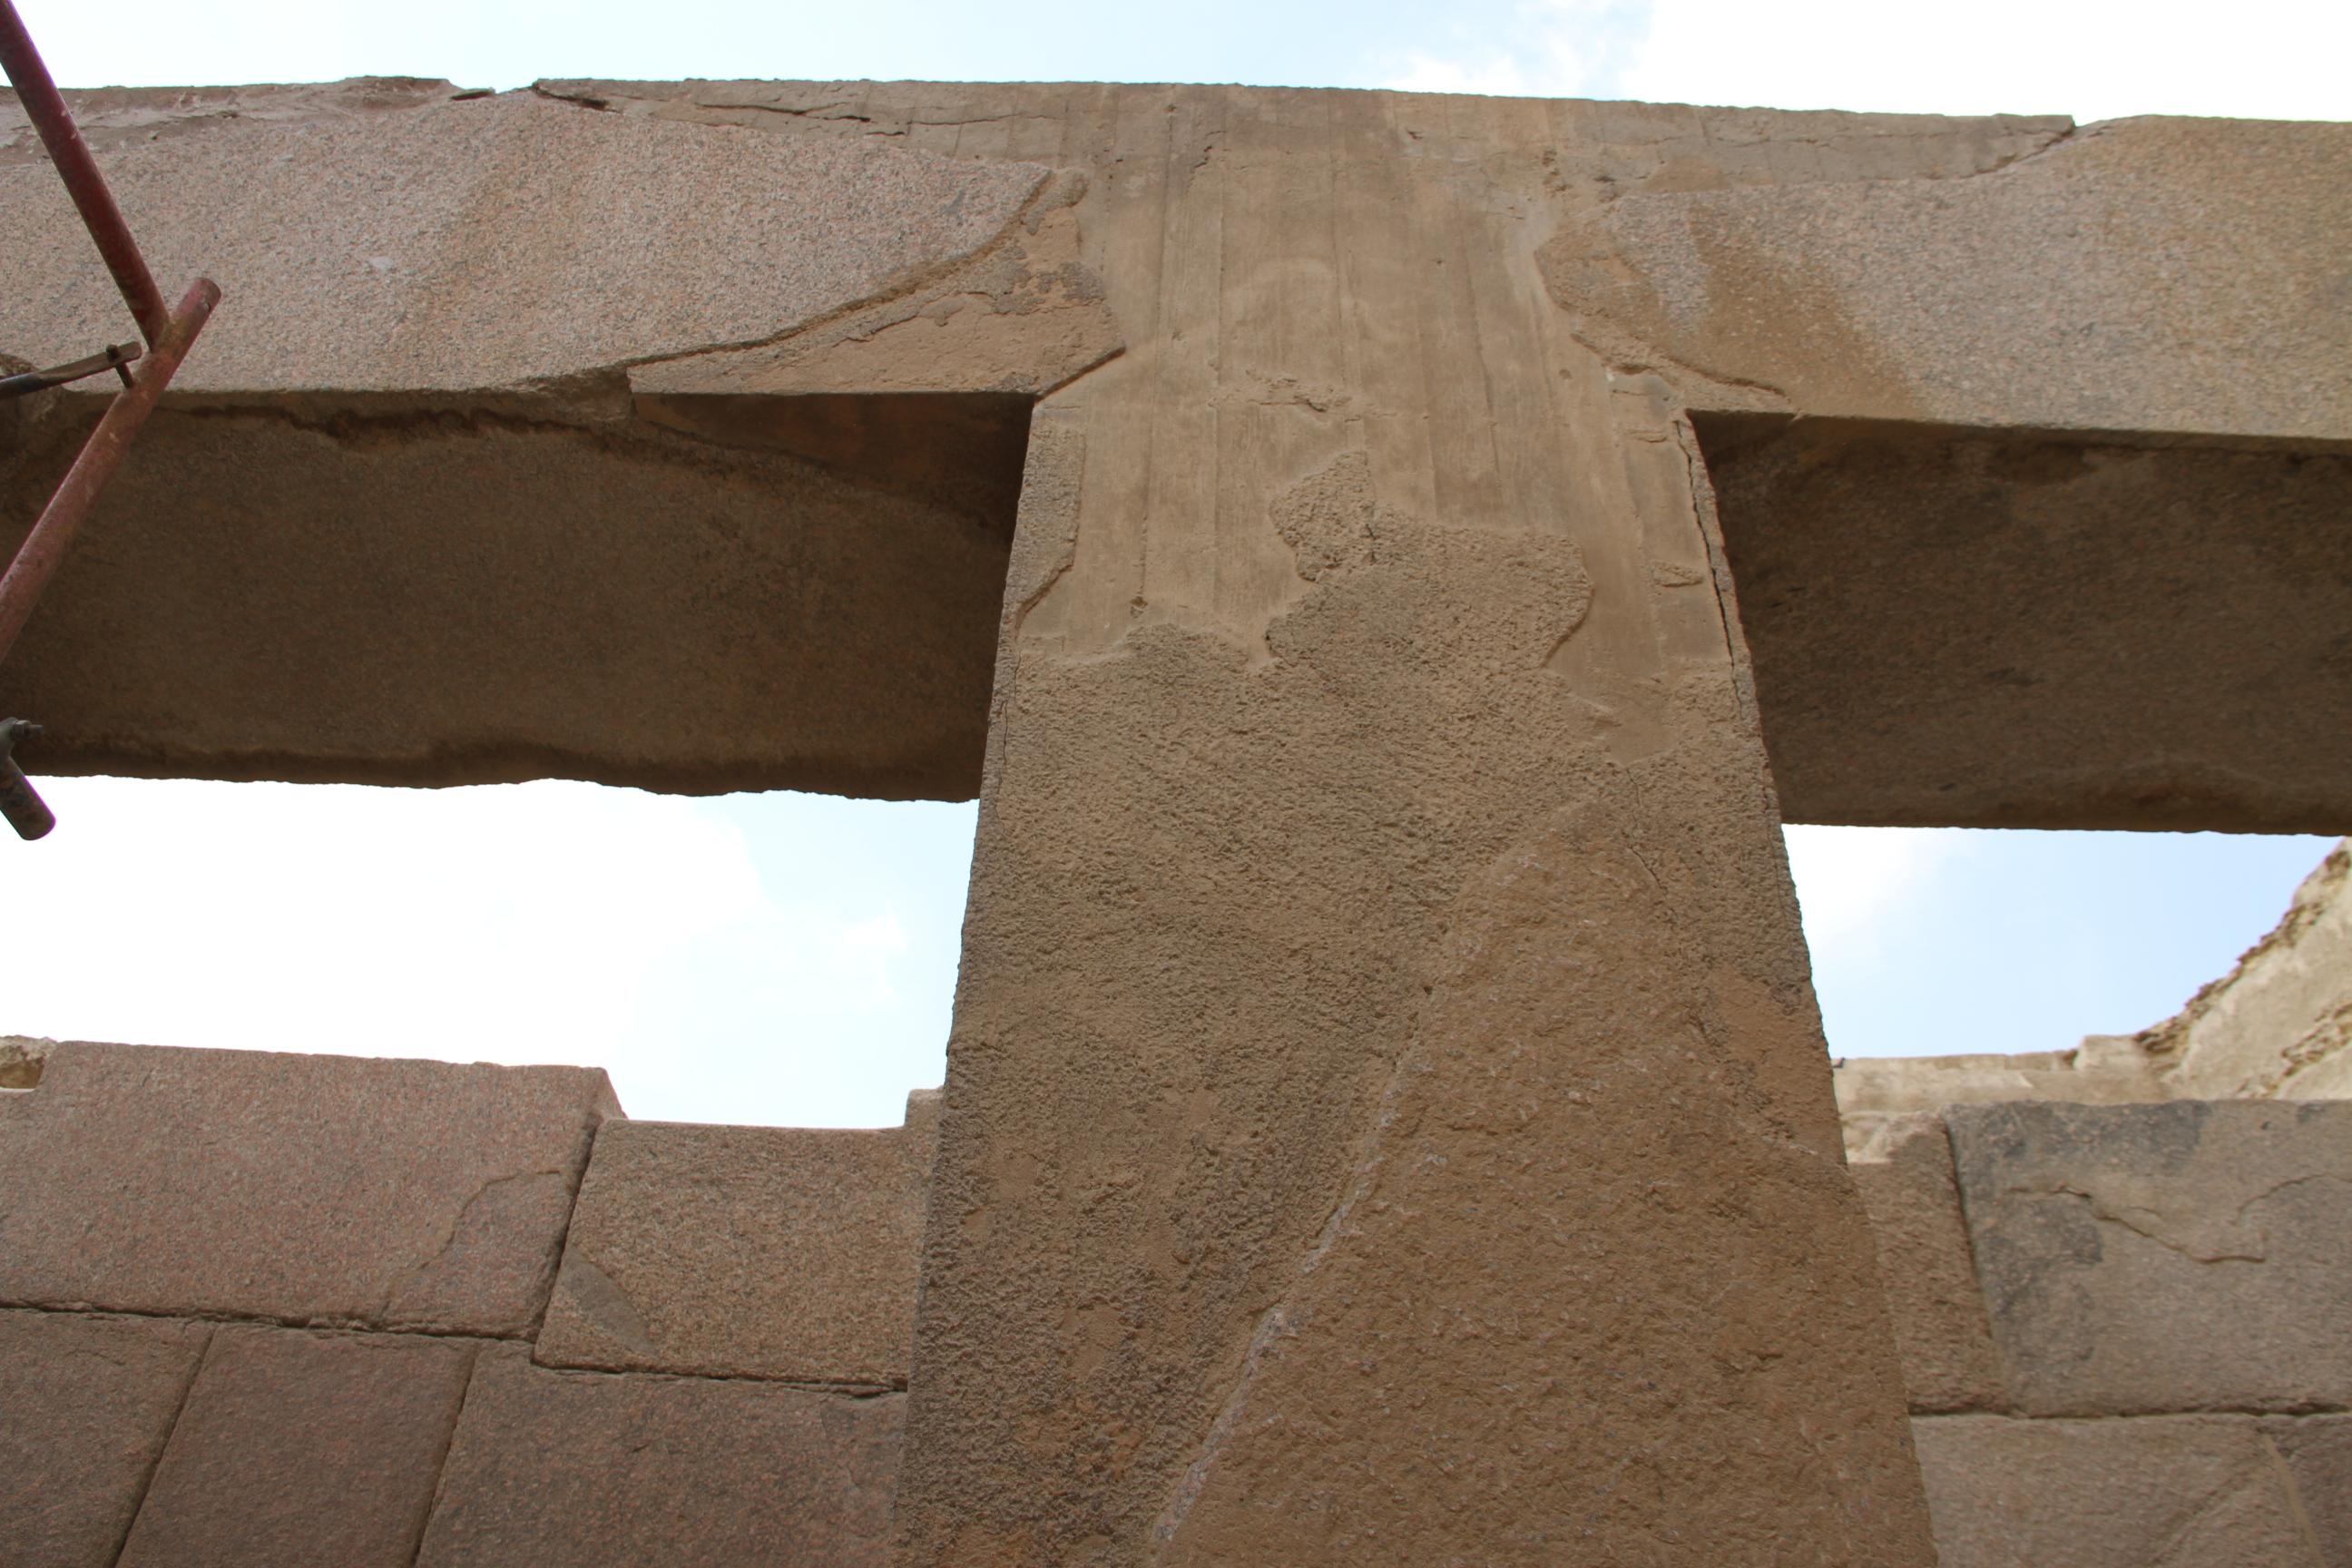 Бетонная реставрация колонн храма упирамиды Хефрена. Слева виден кусочек лесов